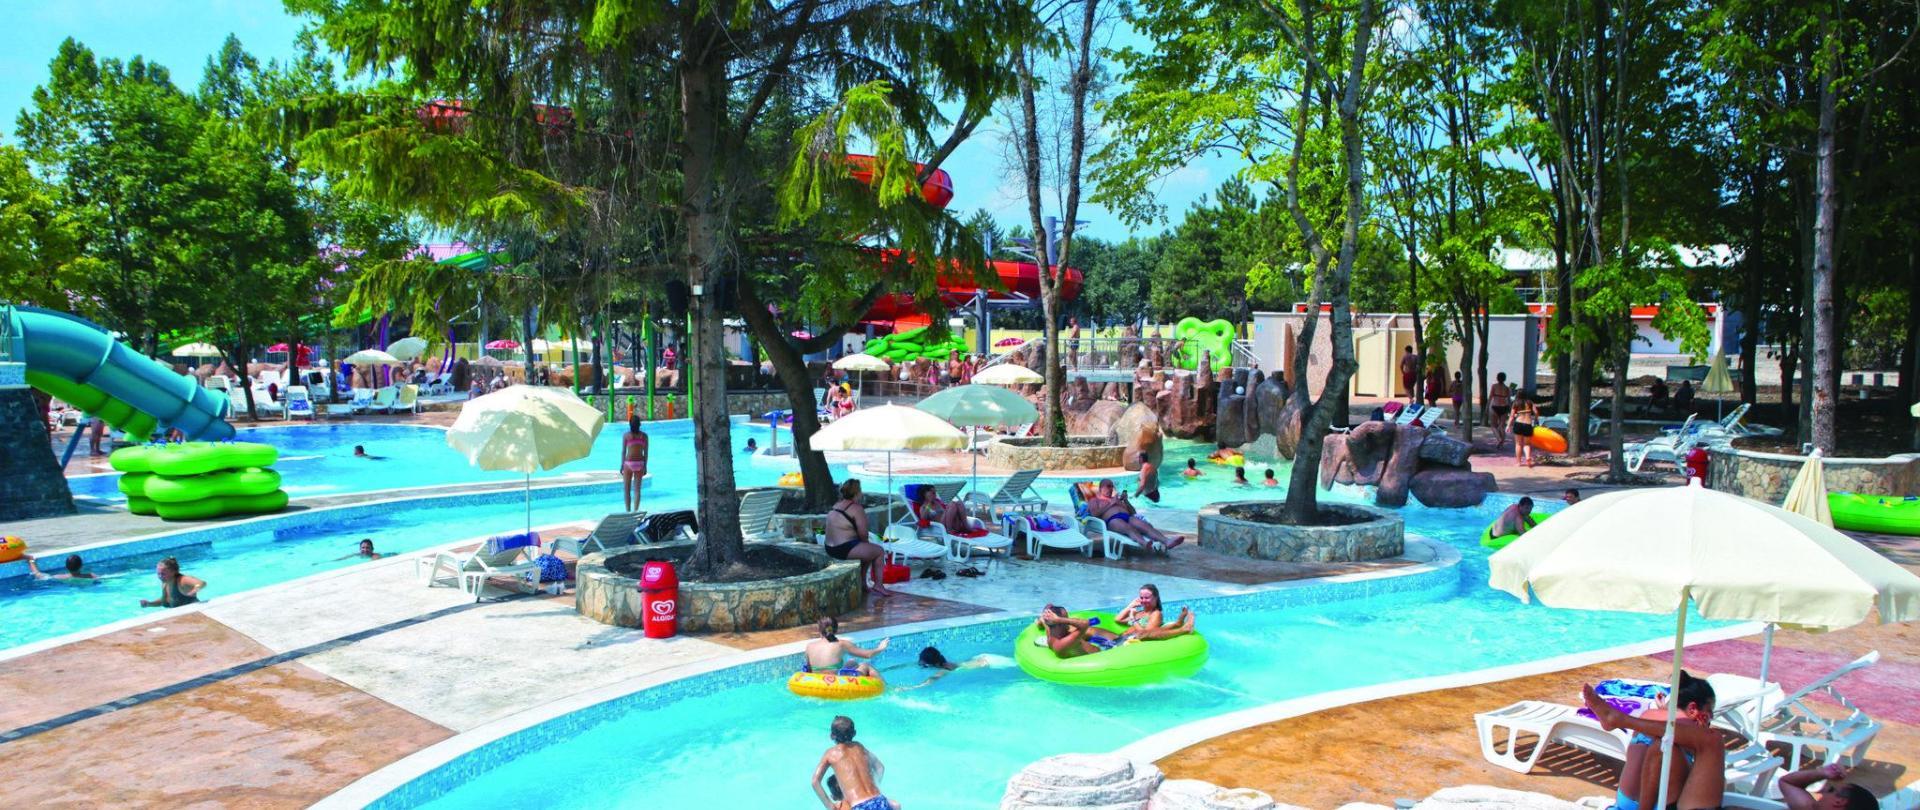 Bulgarien Hotel Primasol Ralitsa Aqua Park